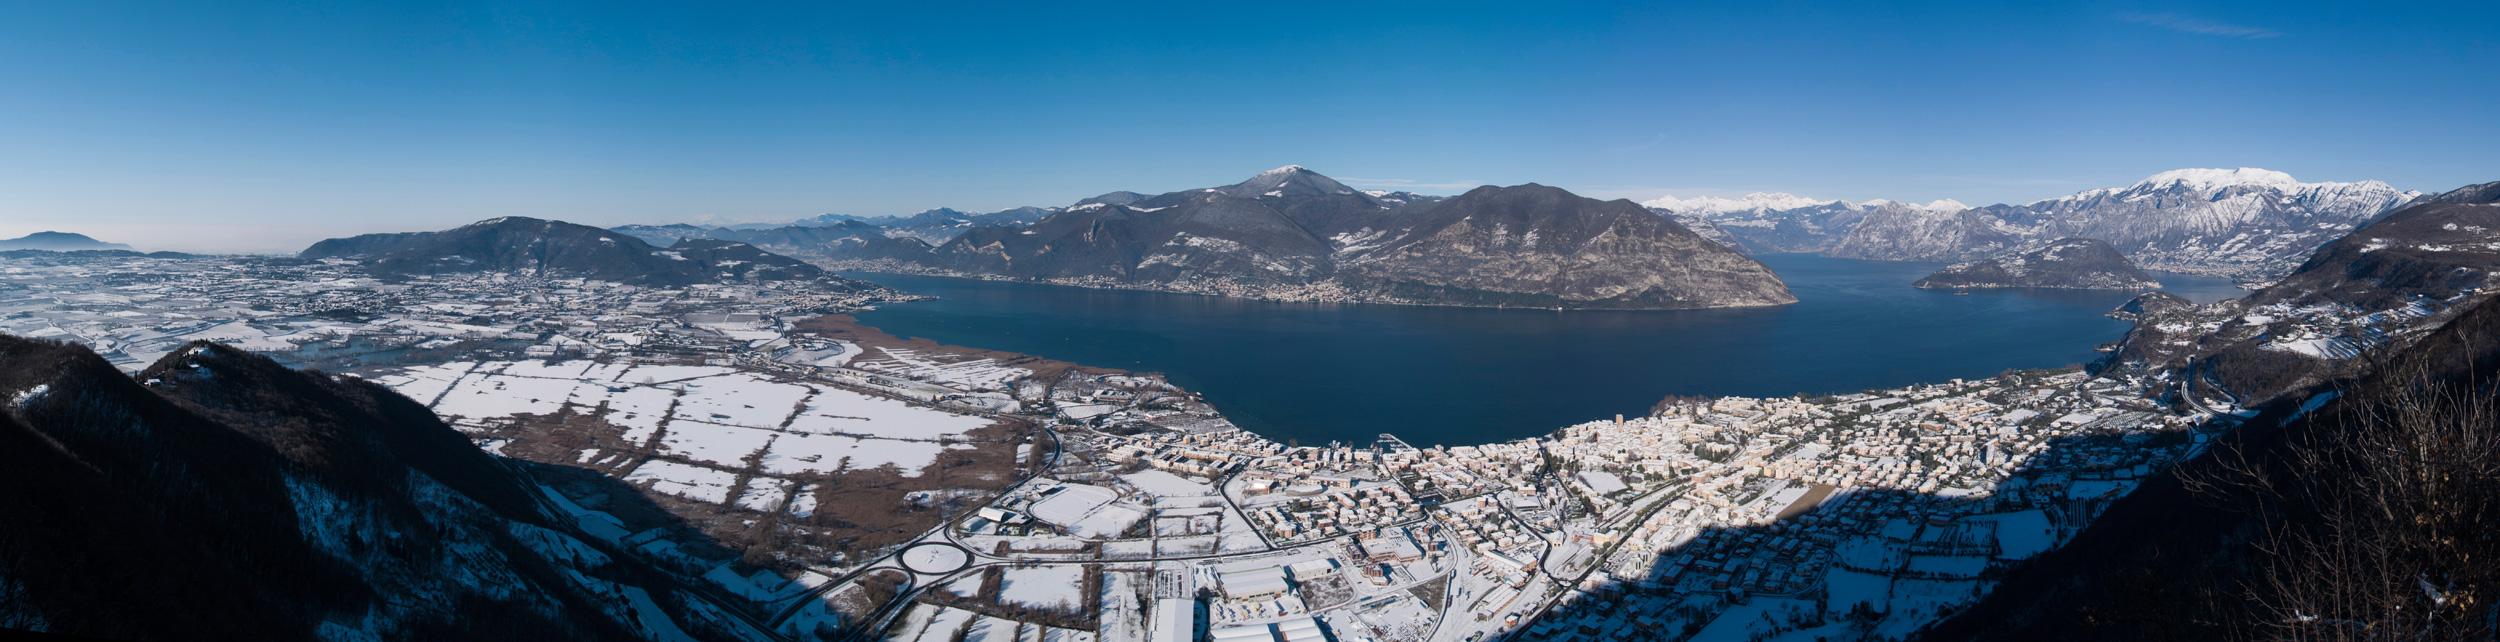 Panorama-in-snow.jpg